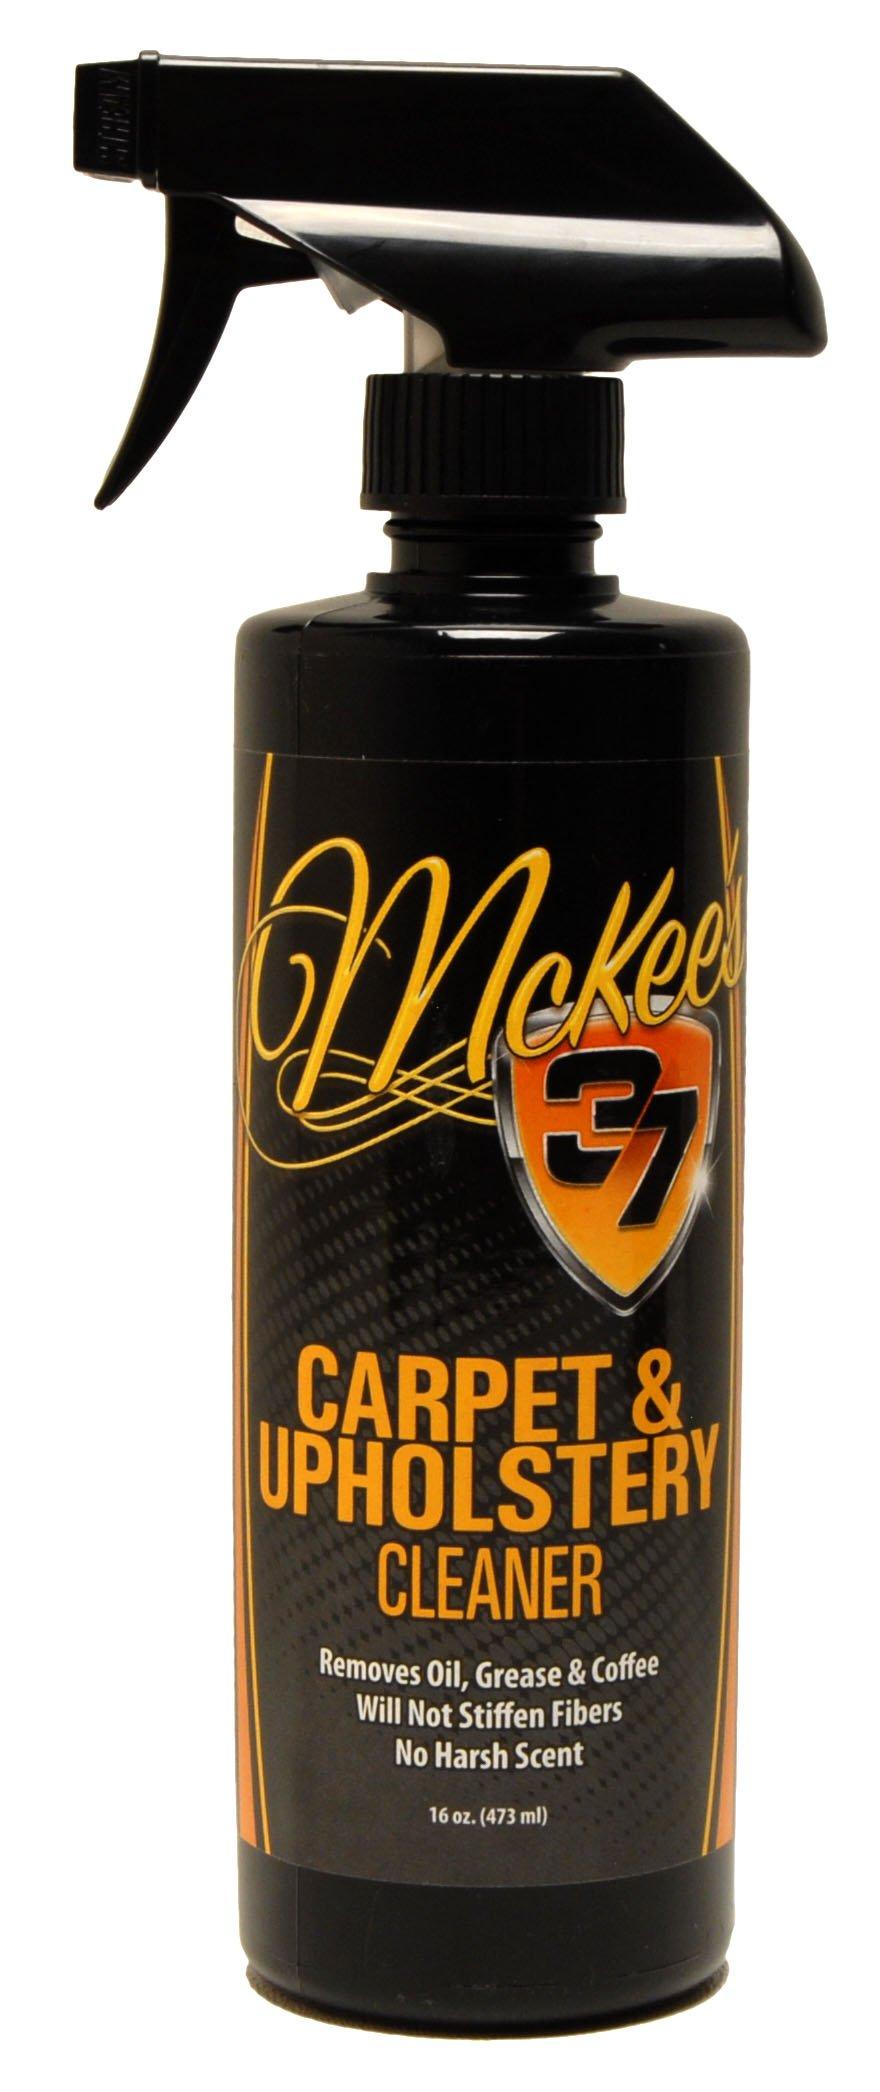 McKee's 37 MK37-310 Carpet & Upholstery Cleaner, 16 oz.